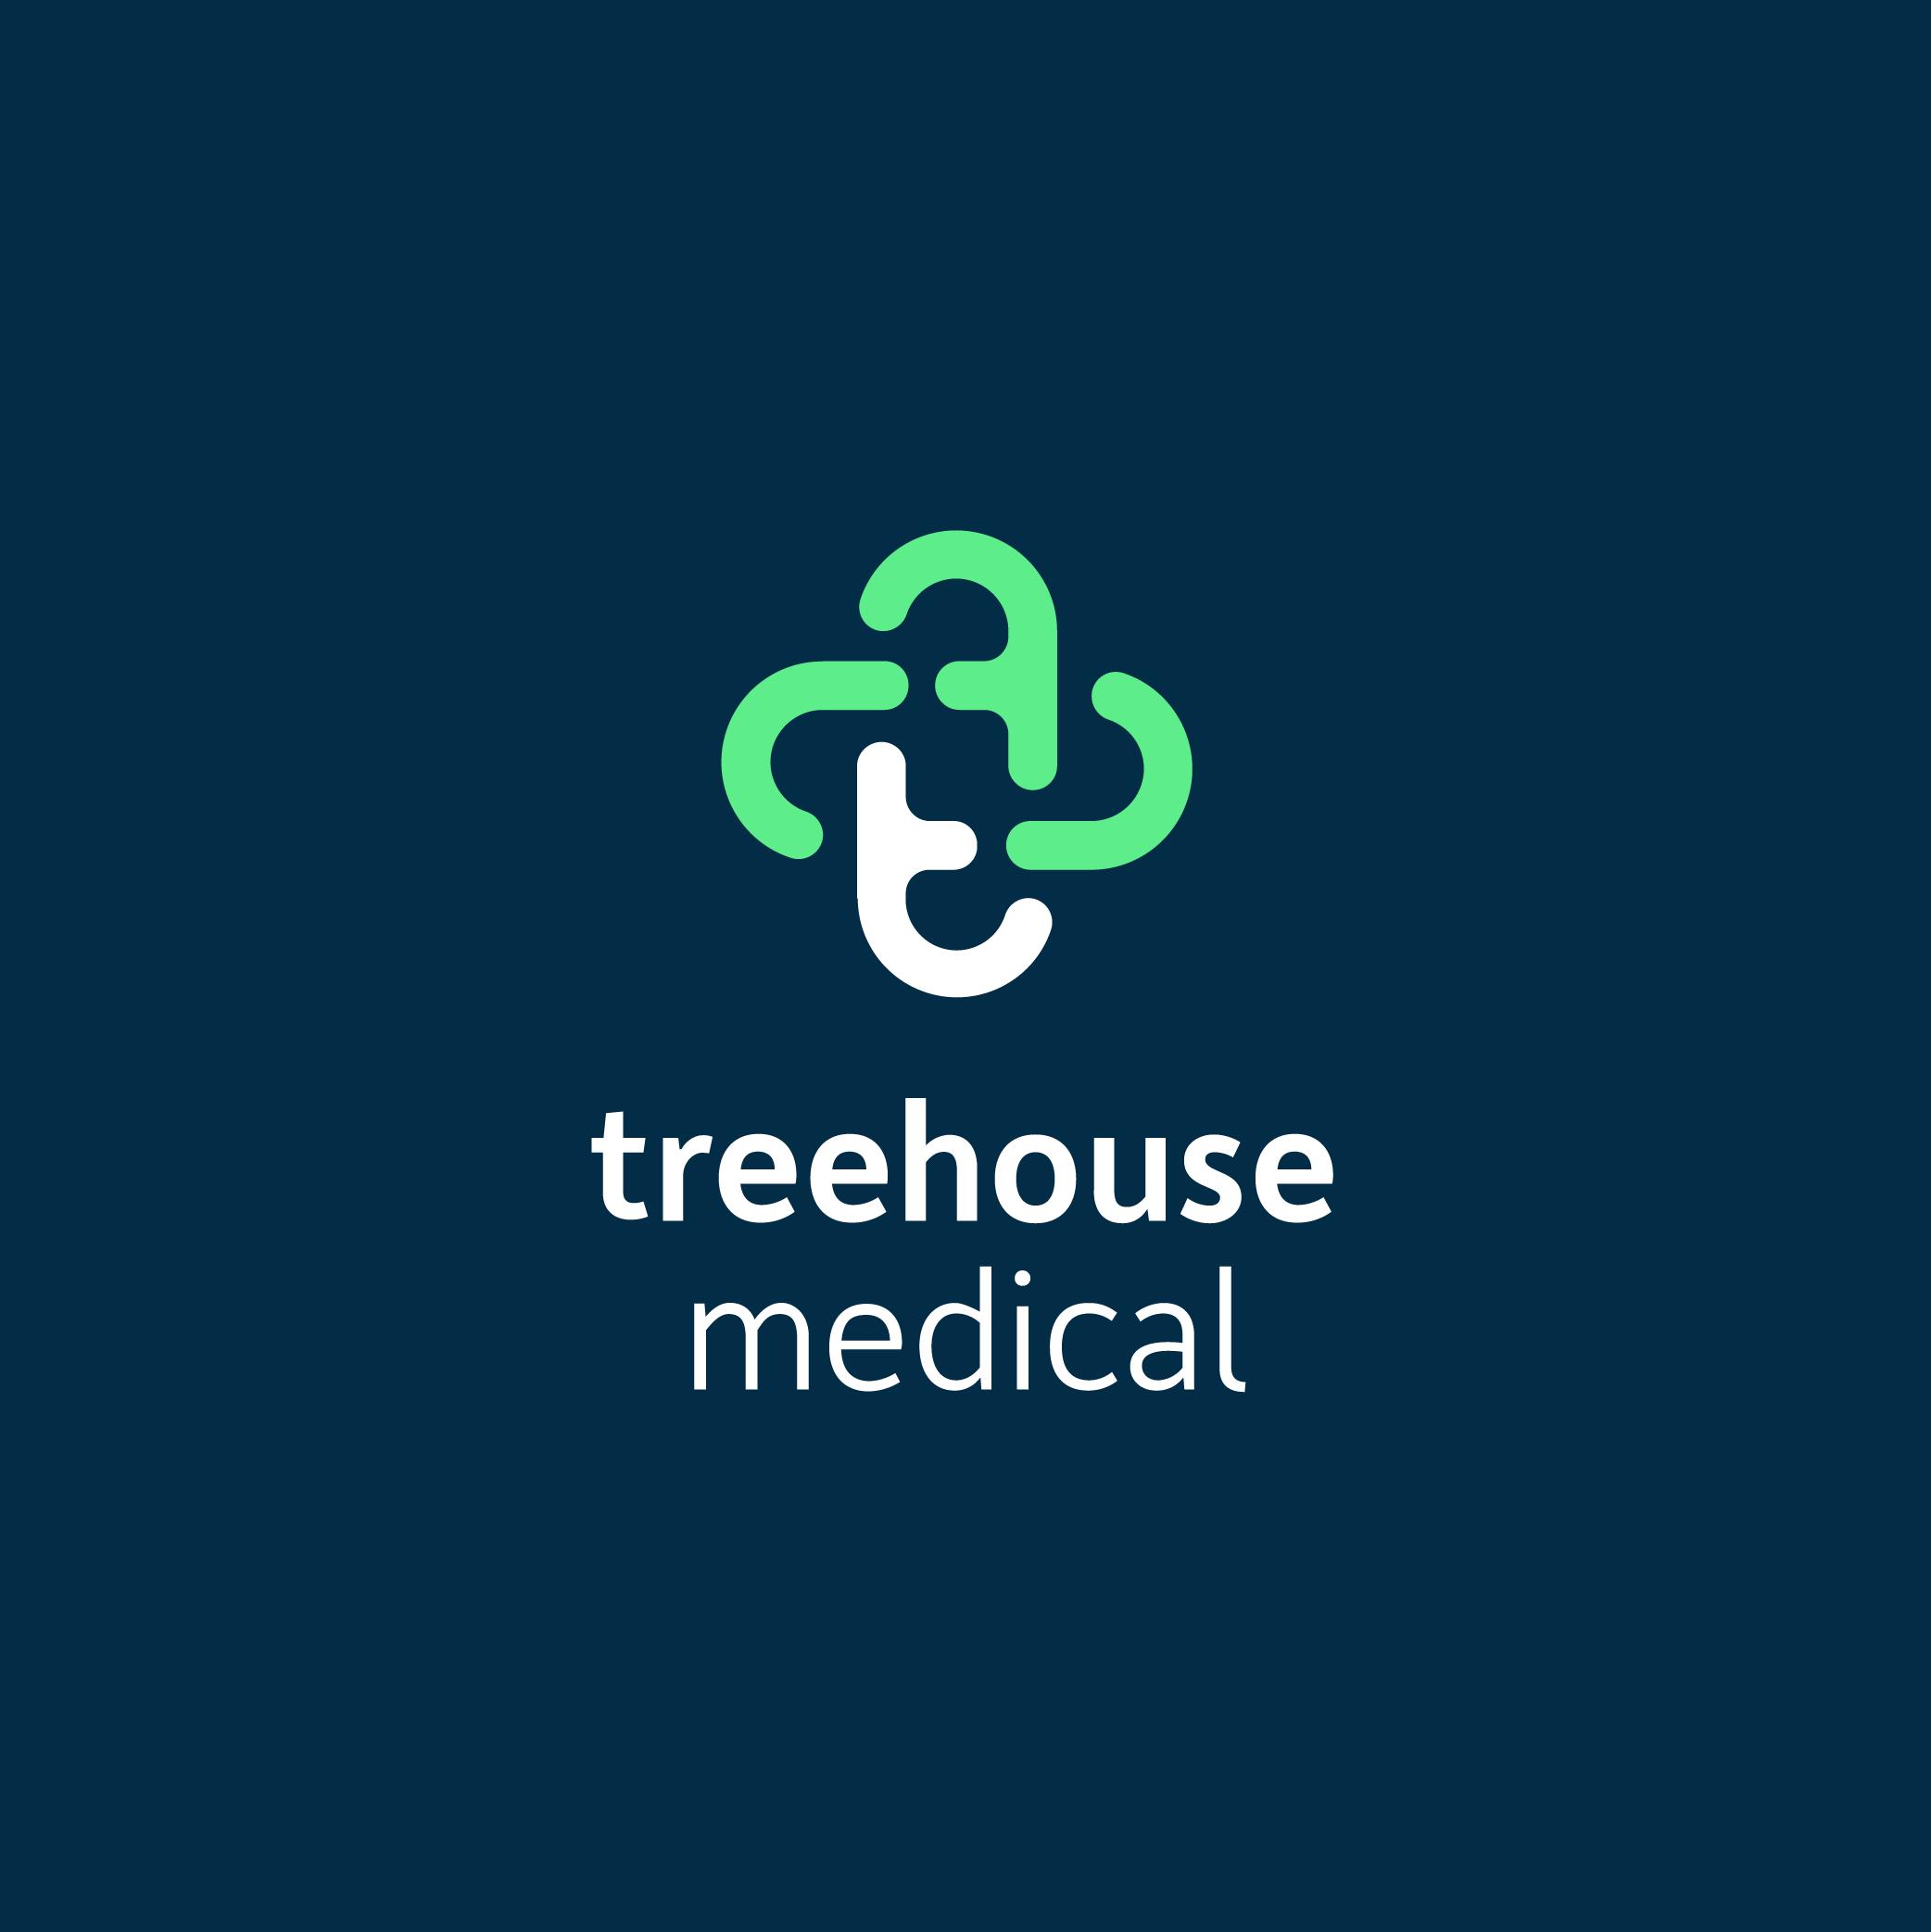 treehouse medical logo design